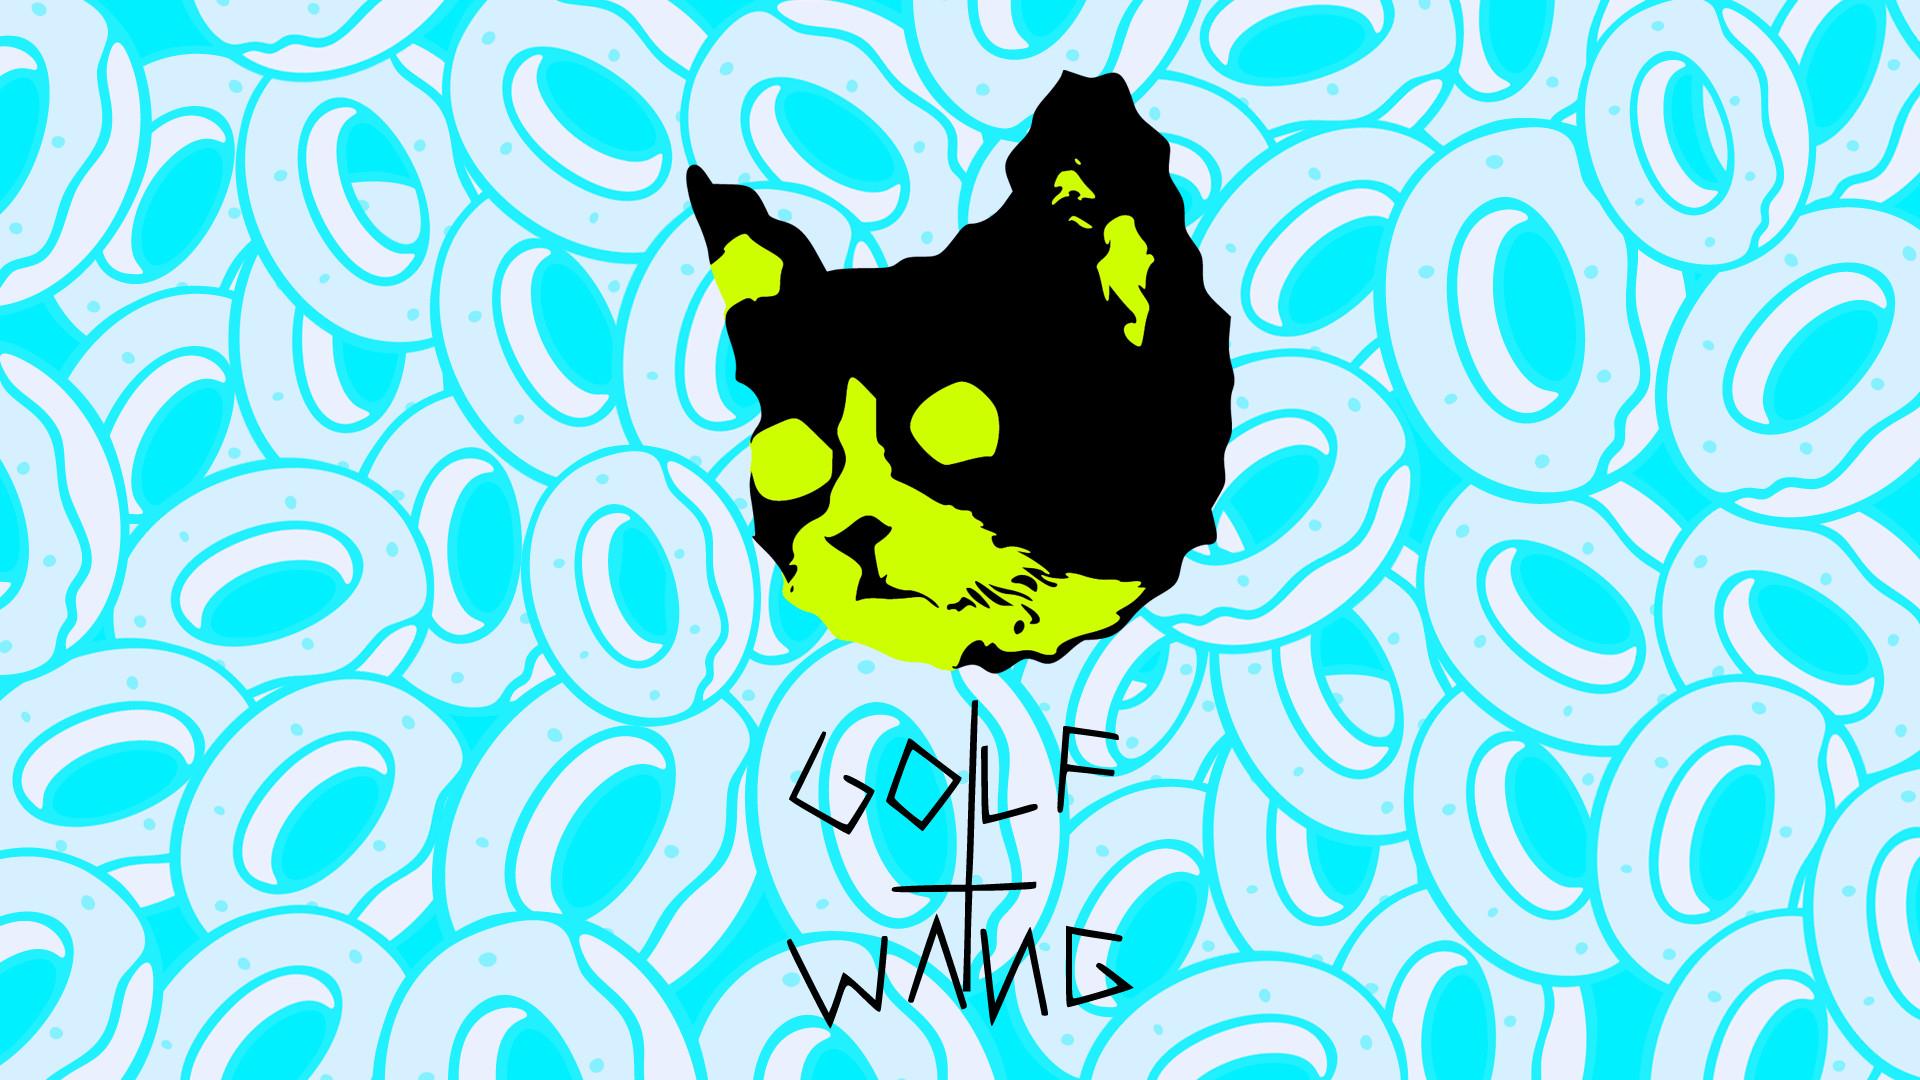 Odd Future Iphone Wallpaper Tumblr Ofwgkta wallpaper HTML code